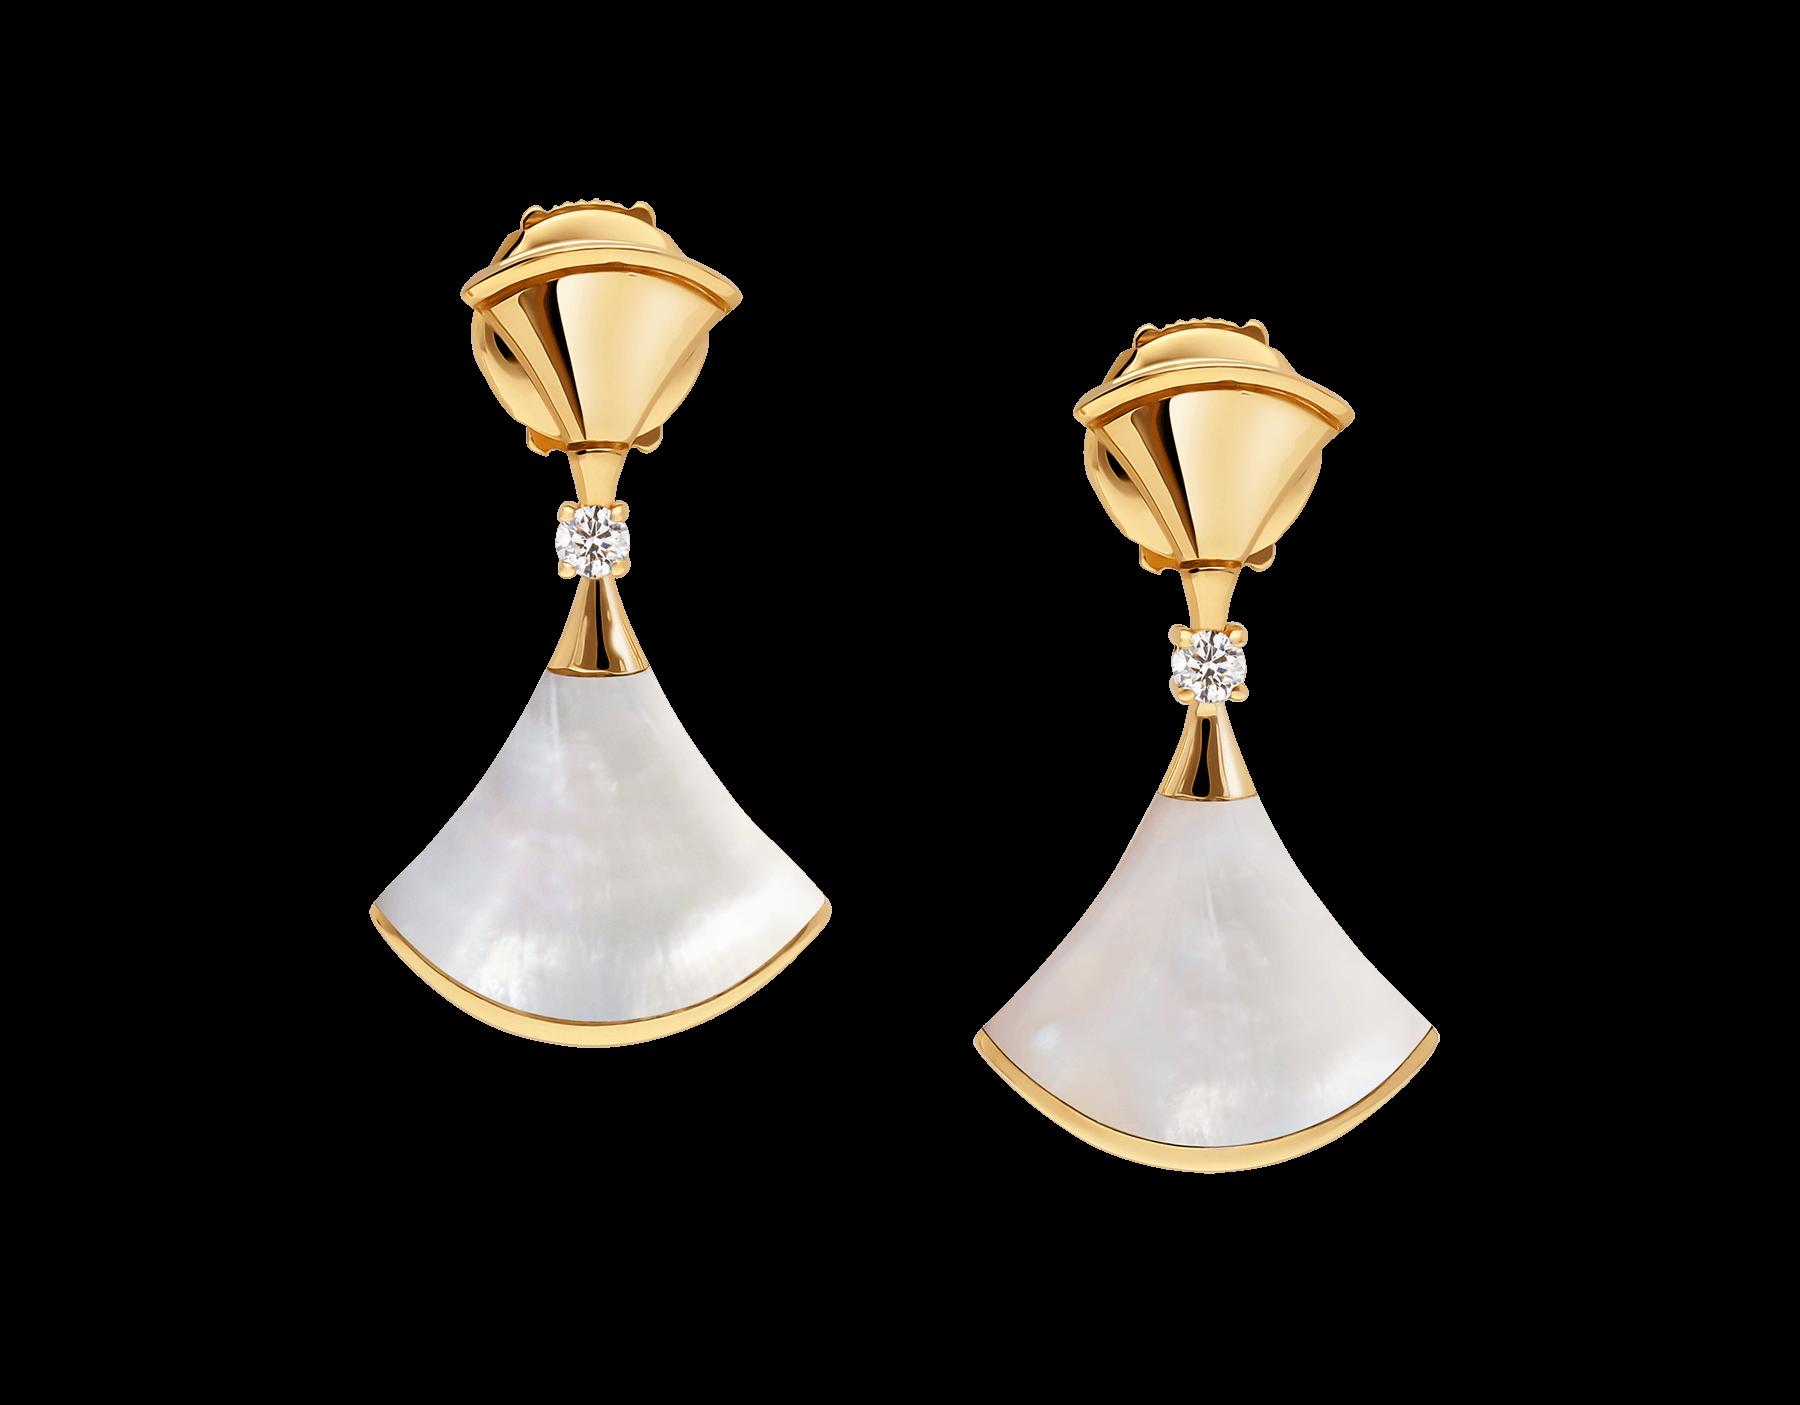 duplicate bulgari earrings